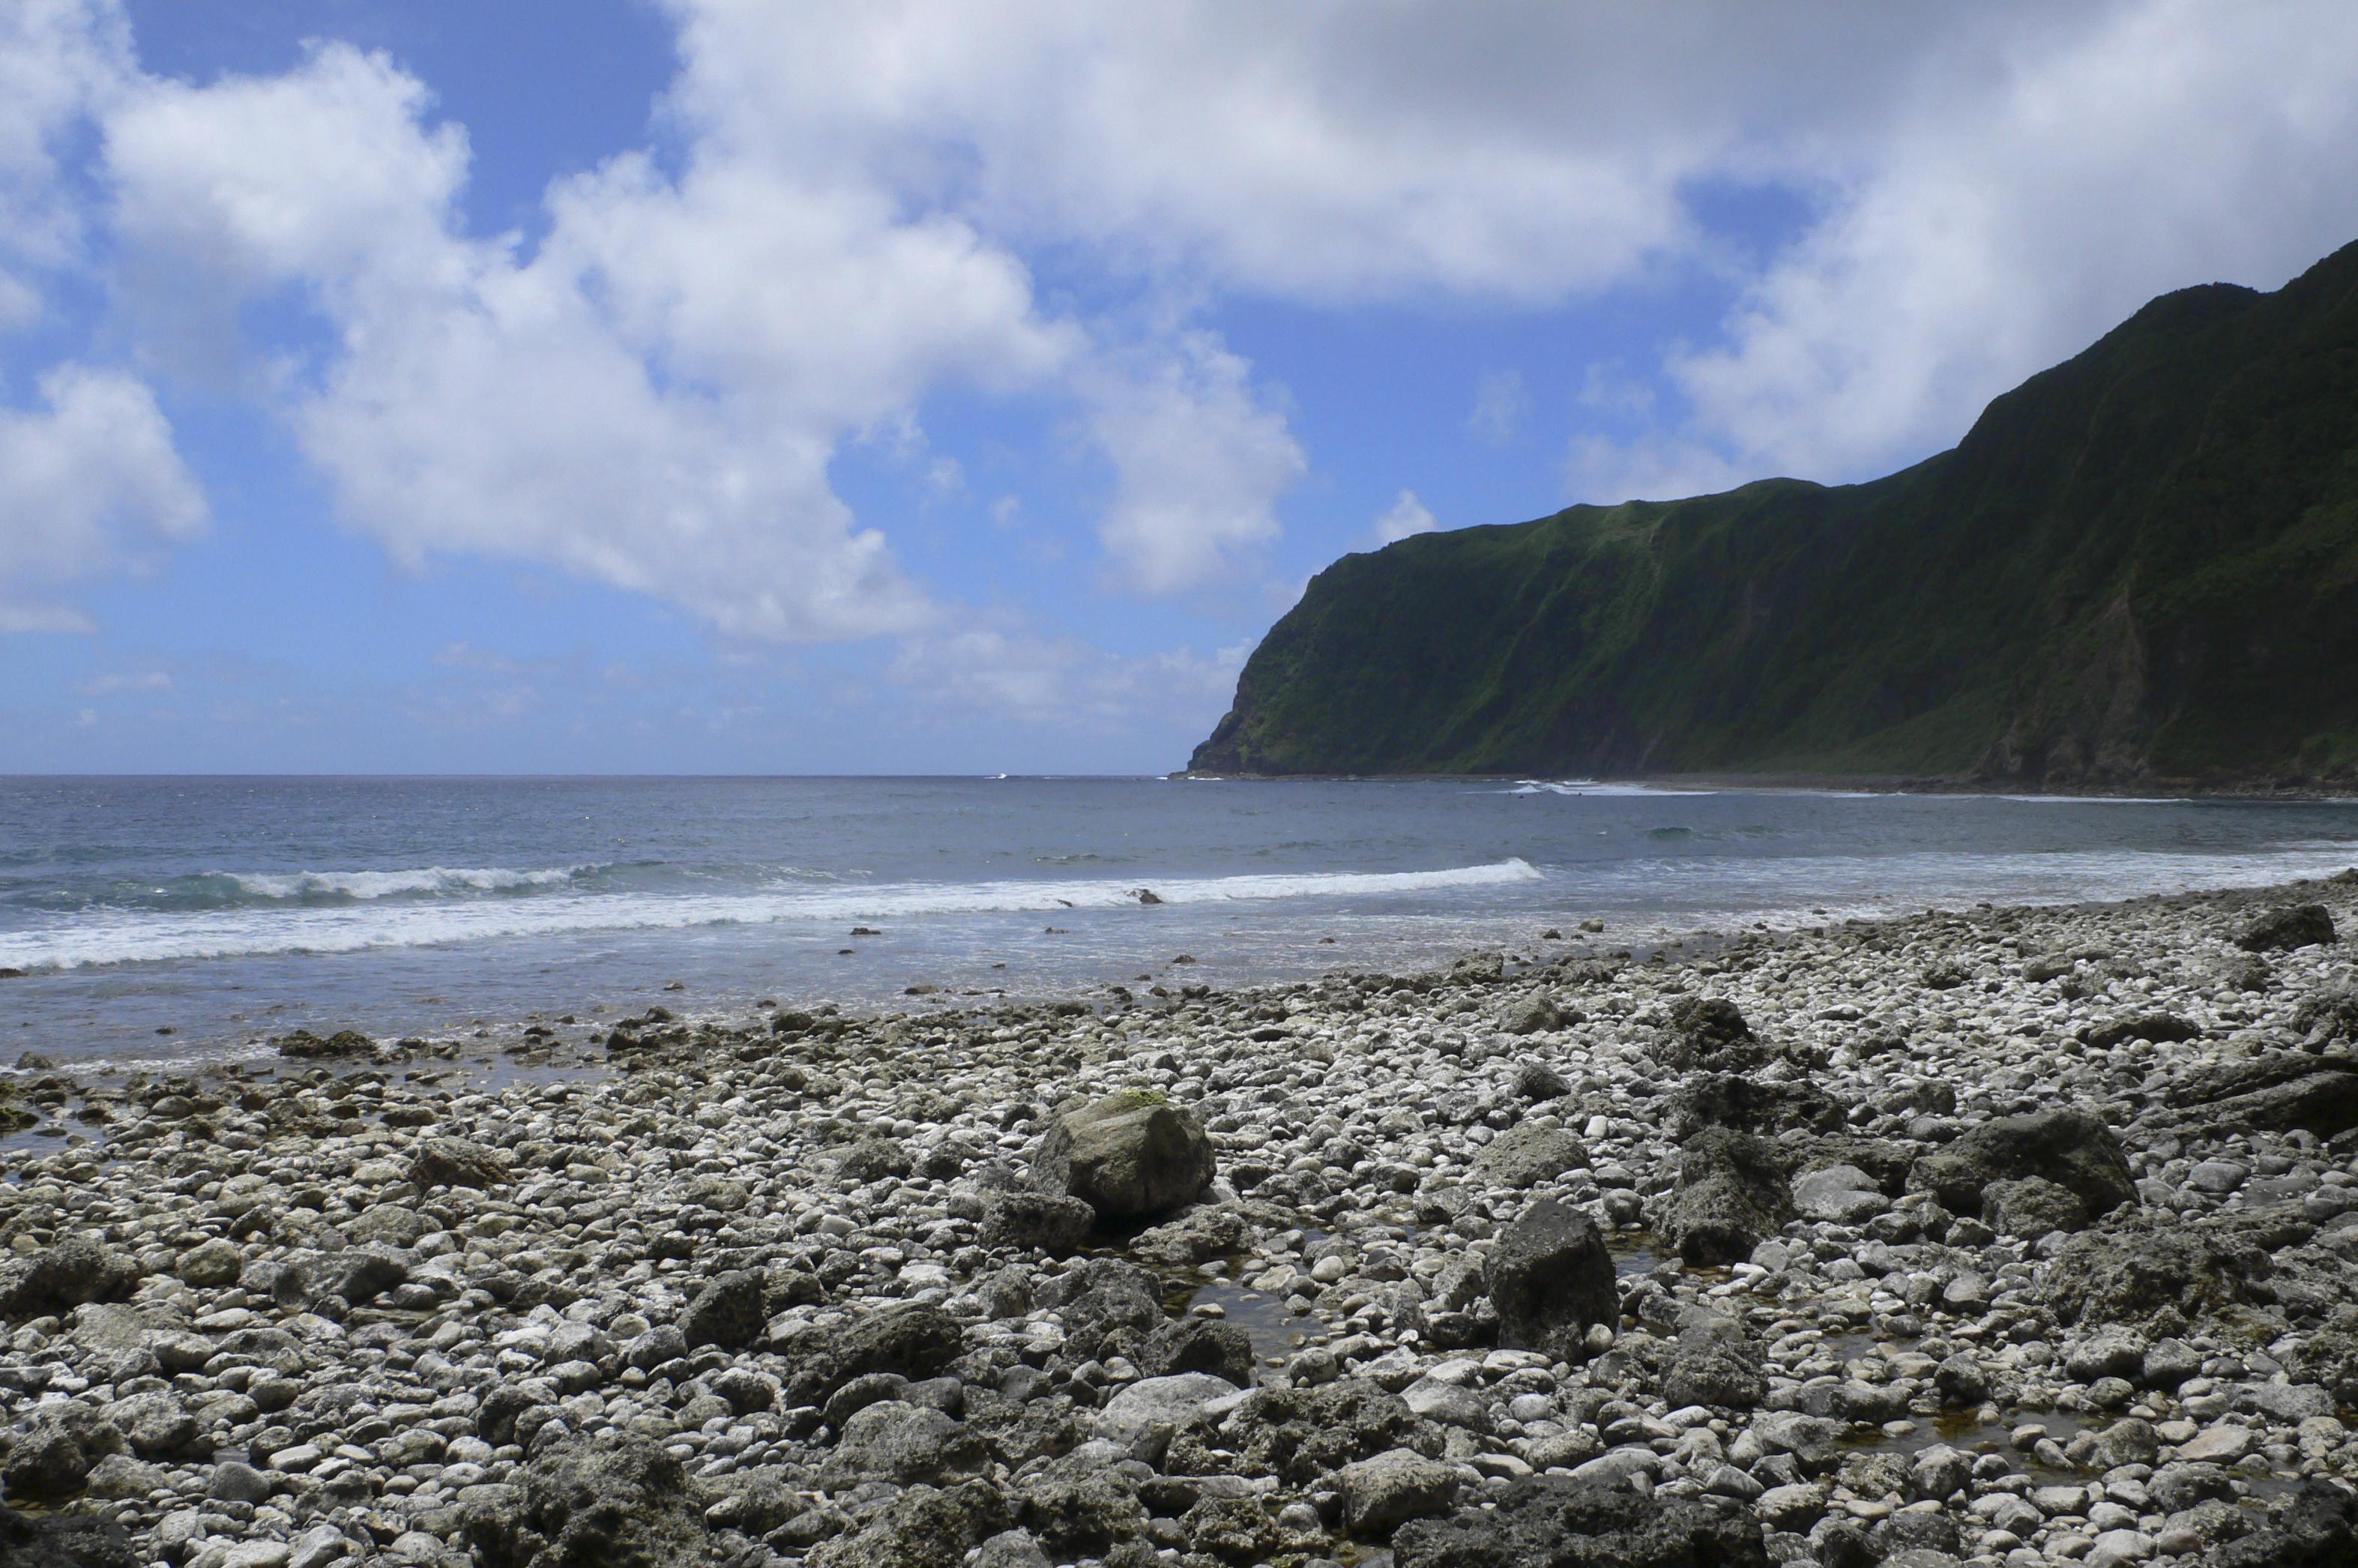 Hachijō